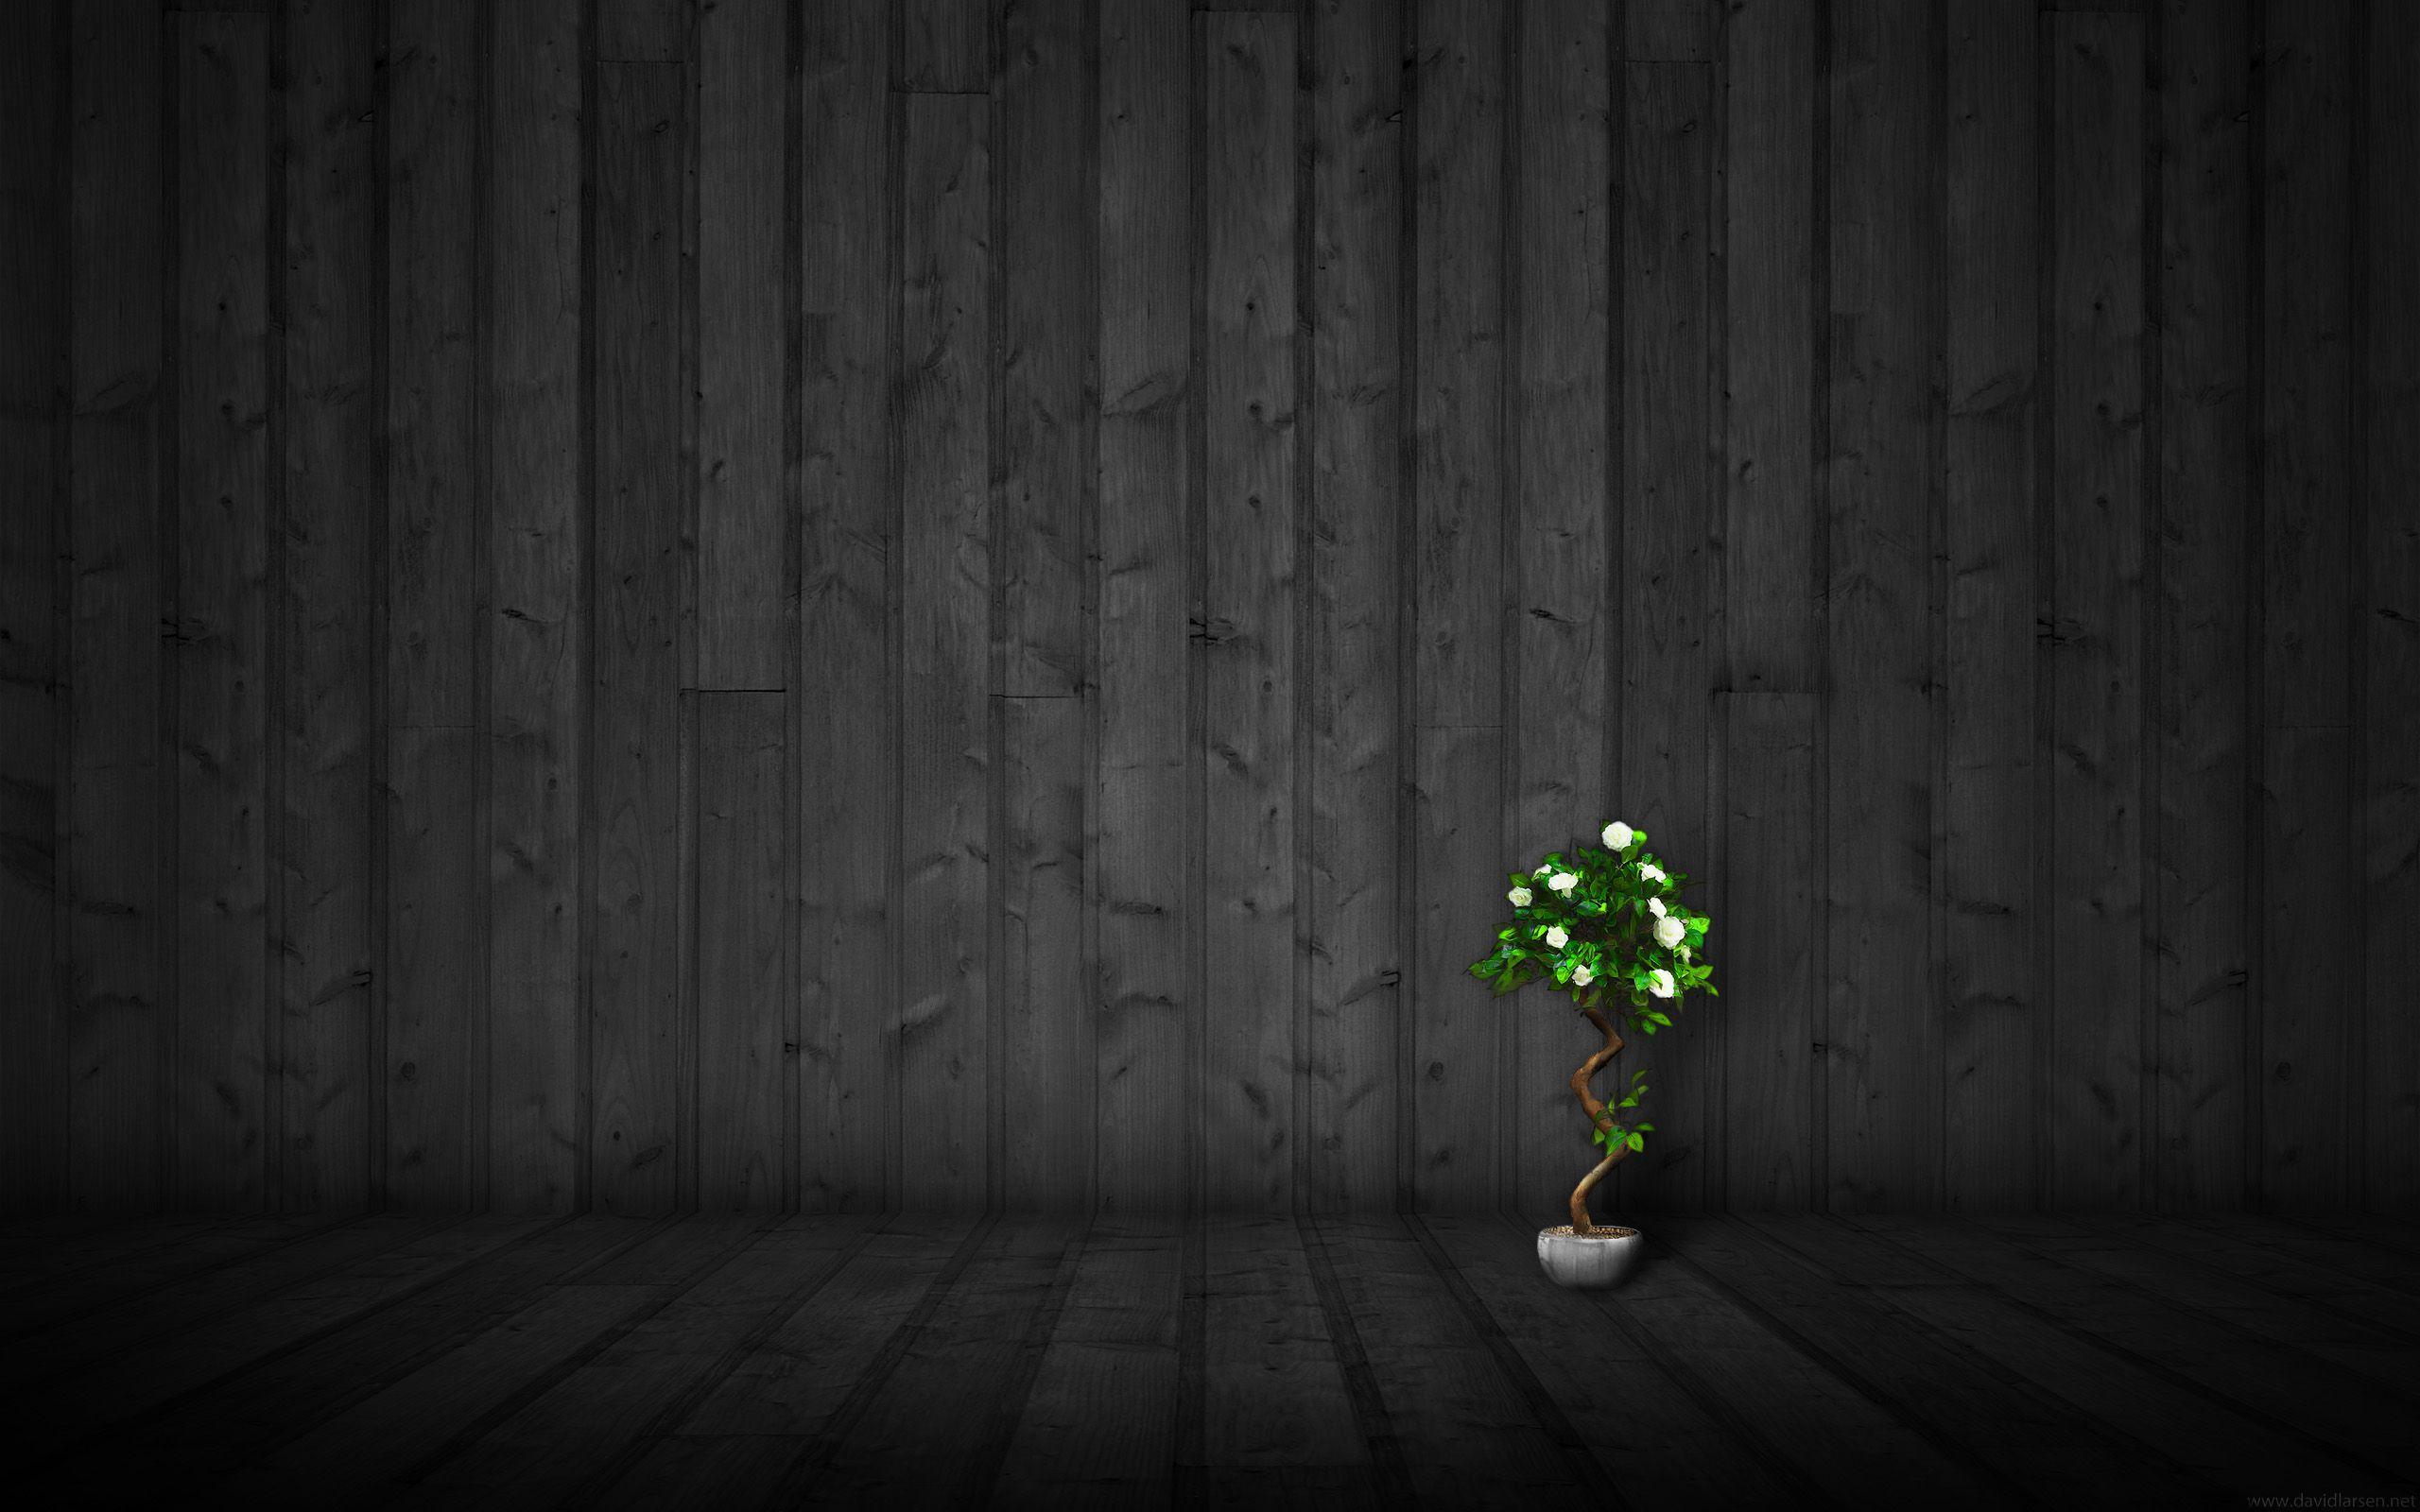 Dark Wood 2 HD Wallpaper Theme Customization HD Wallpapers   i love it   Dark wallpaper, Black ...